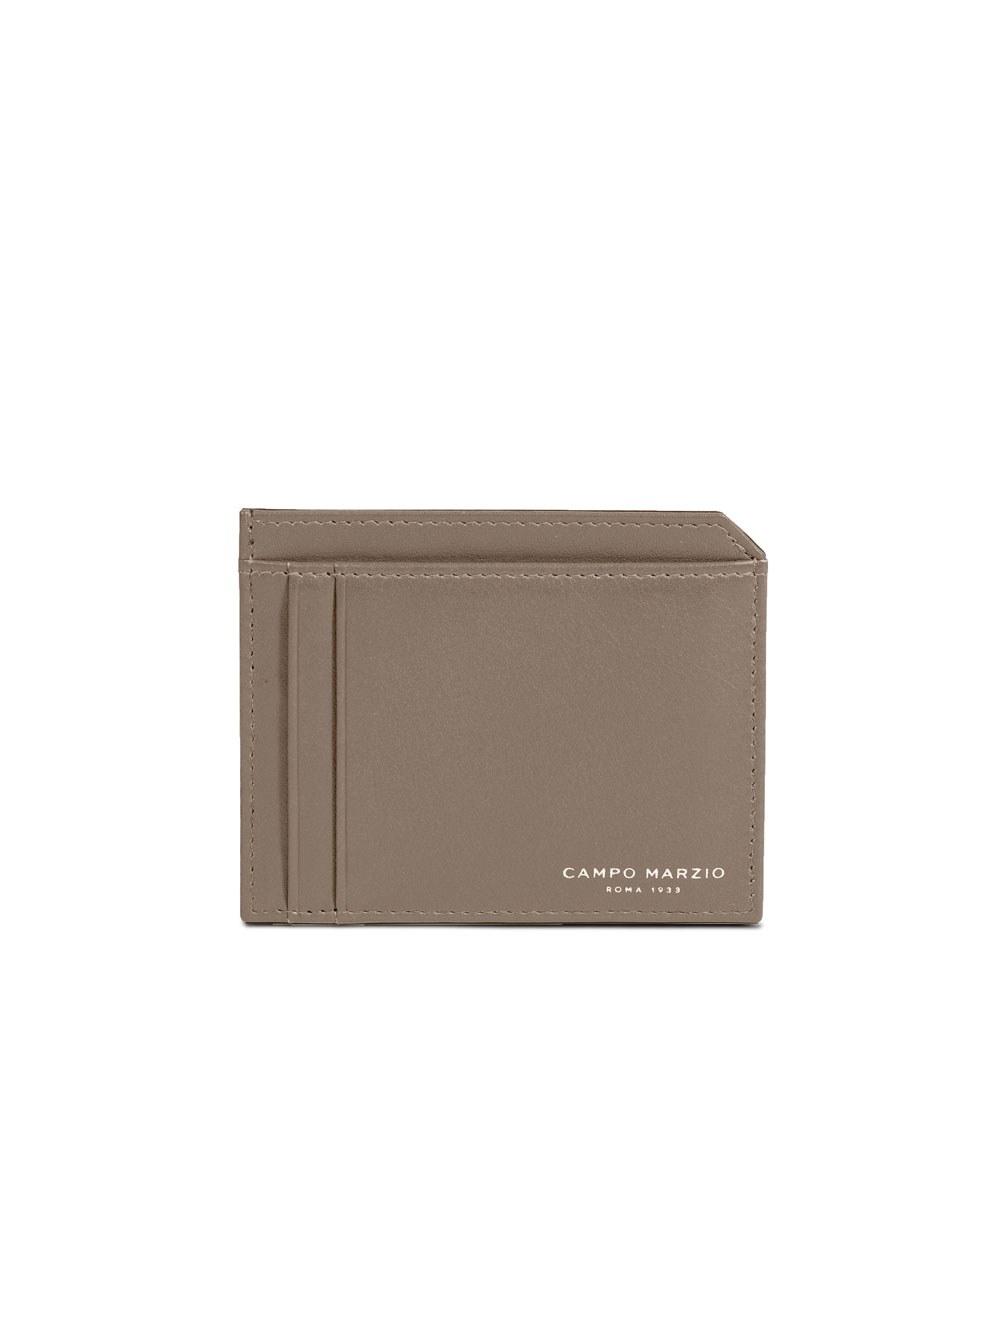 Card Holder Slim - Taupe